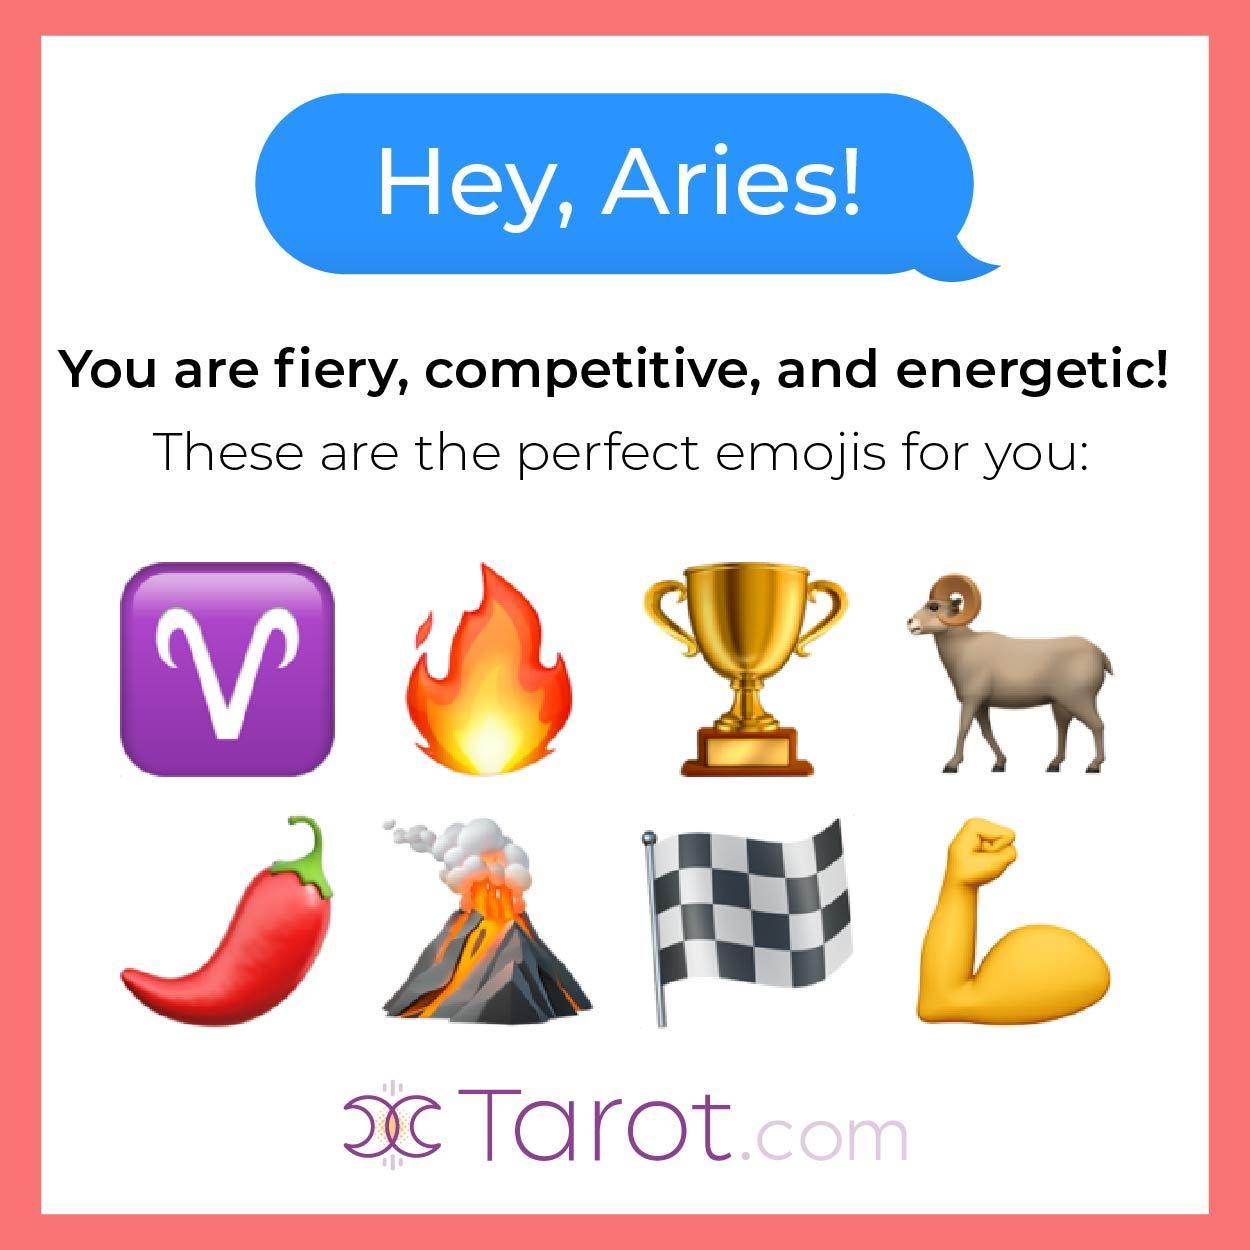 Aries Emojis